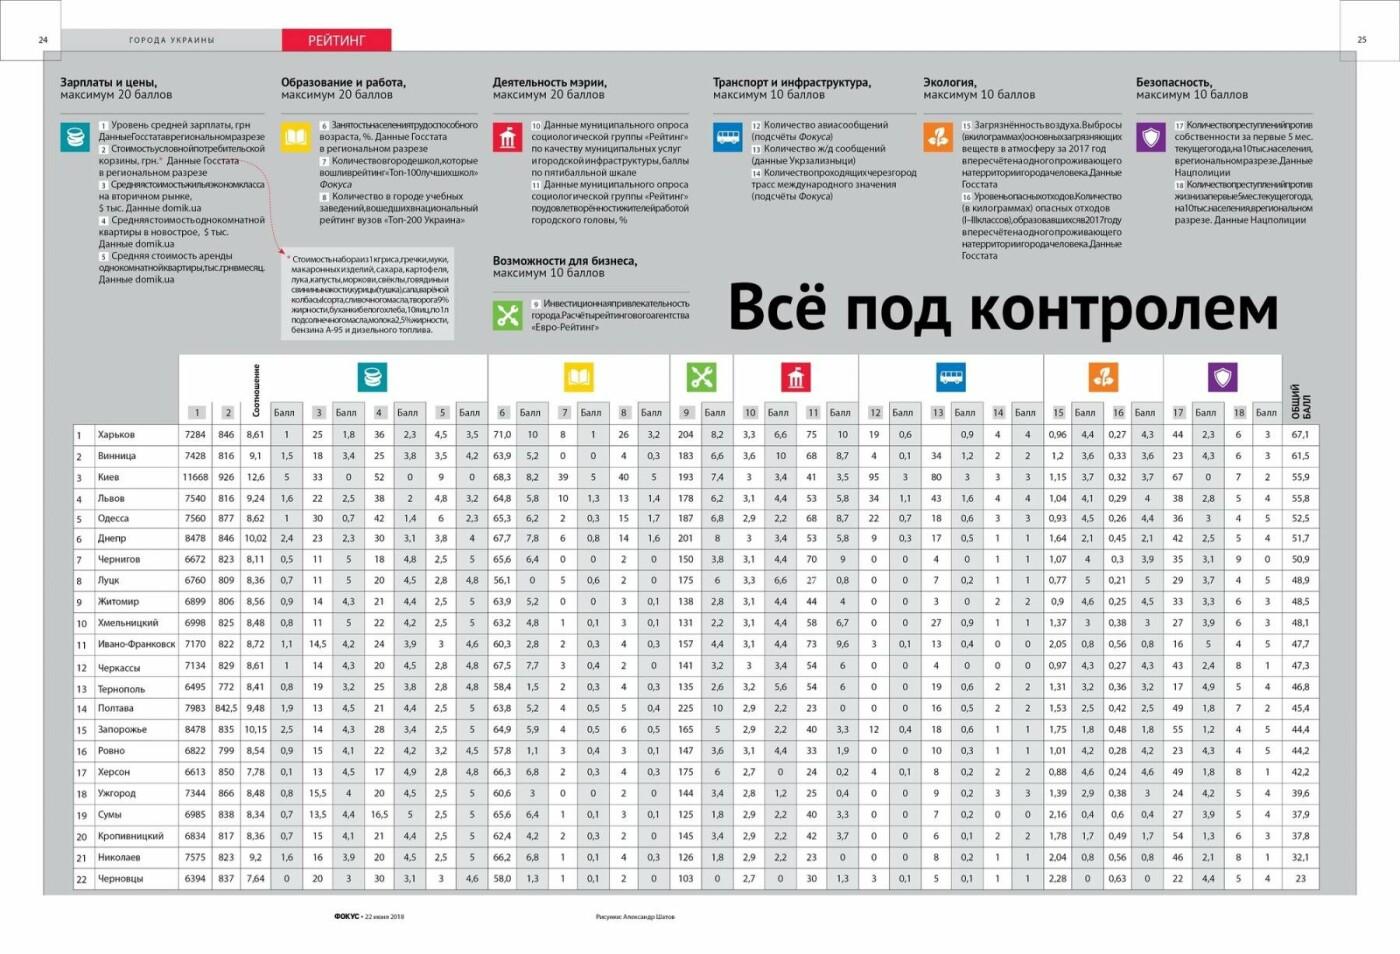 Луцьк у десятці комфортних міст України, фото-2